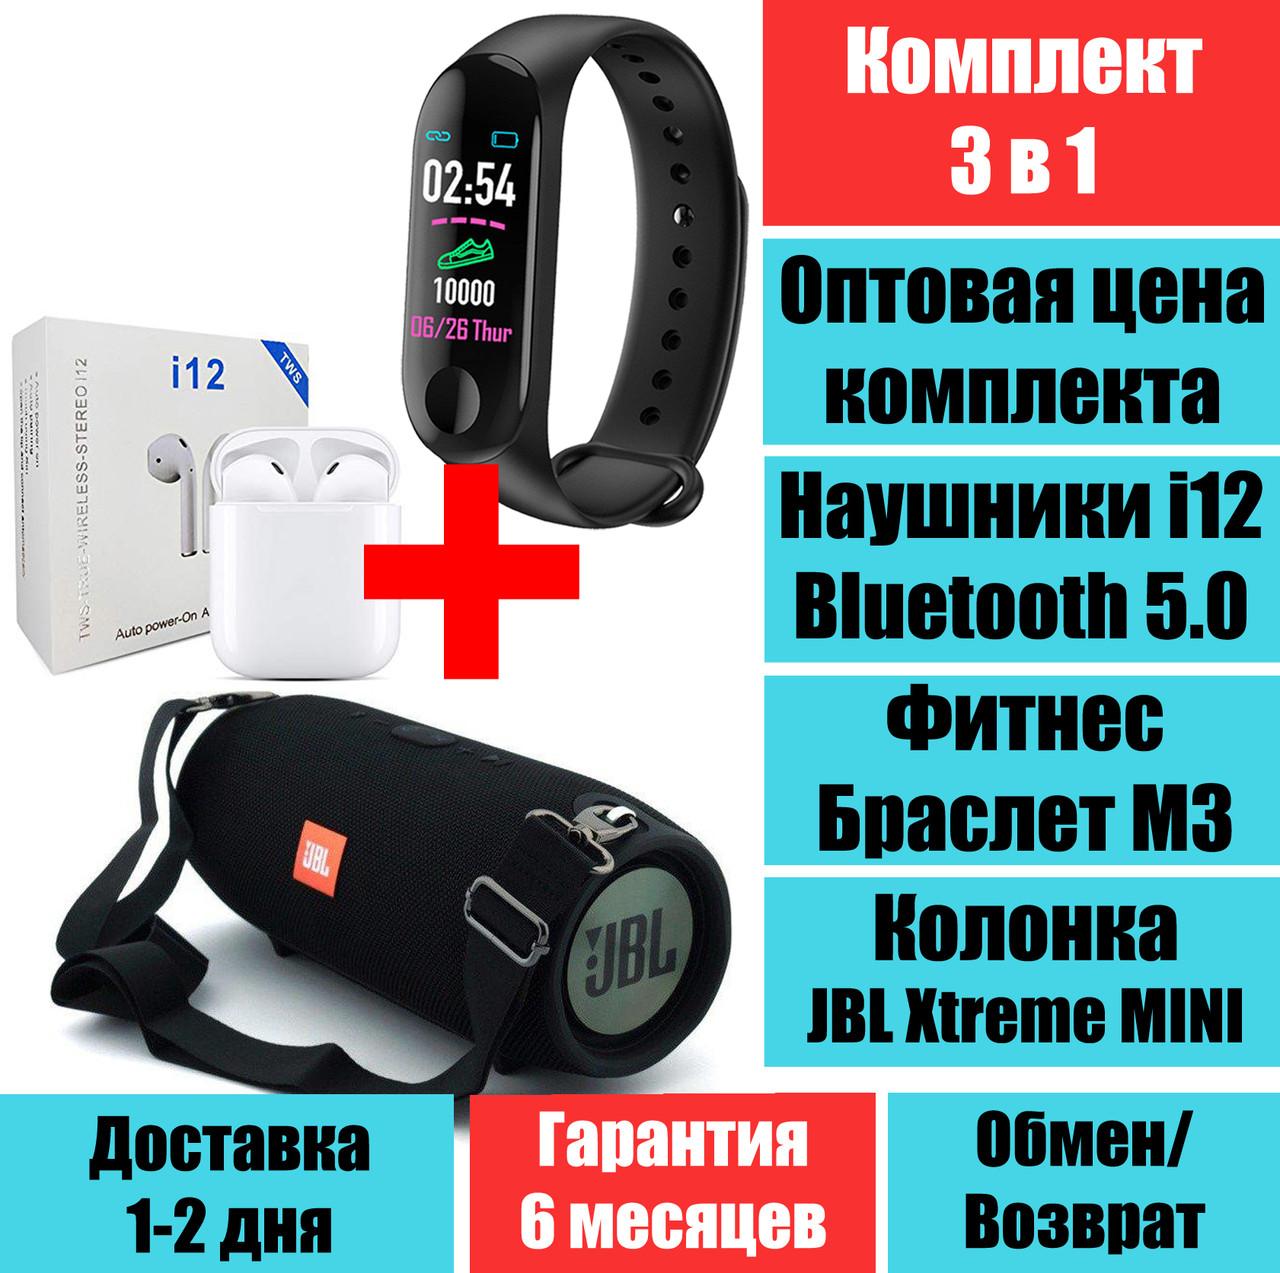 Колонка JBL Xtreme Черный, Фитнес браслет M3, наушники блютус i12 Mini Bluetooth Комплект QualitiReplica